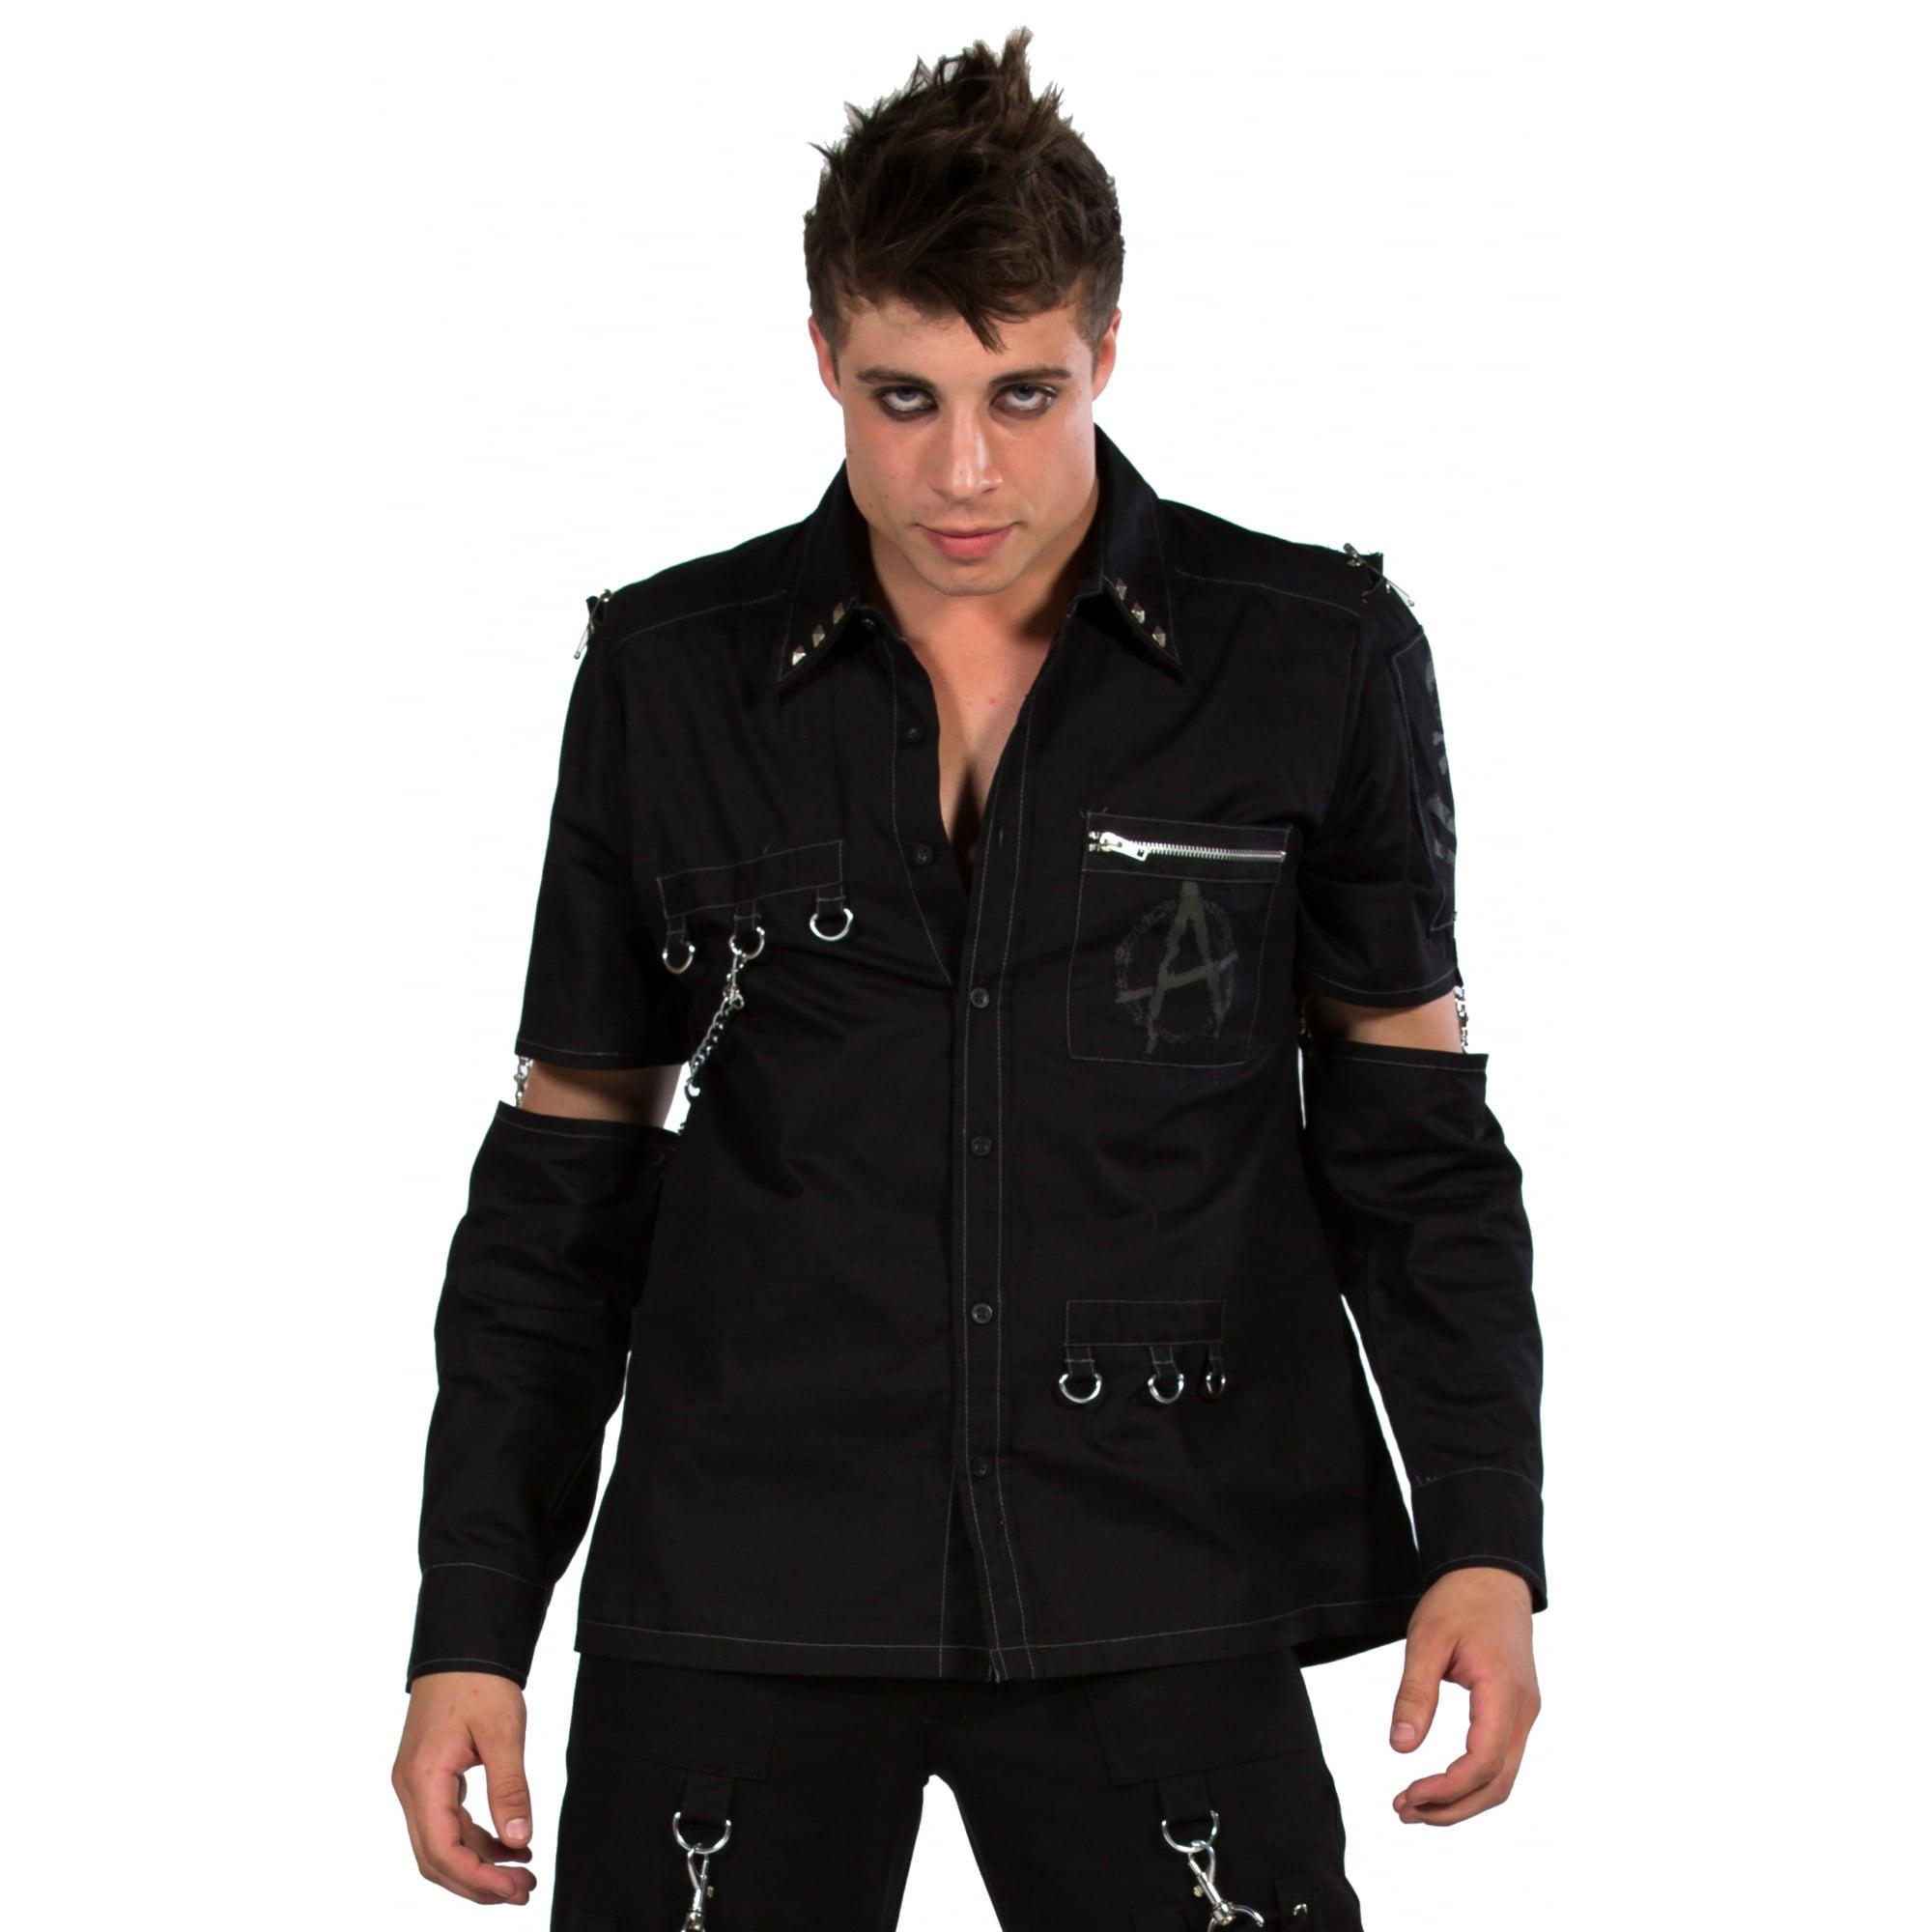 New Dead Threads Shirt Rings /& Zippers Men Metal Punk Emo Rock